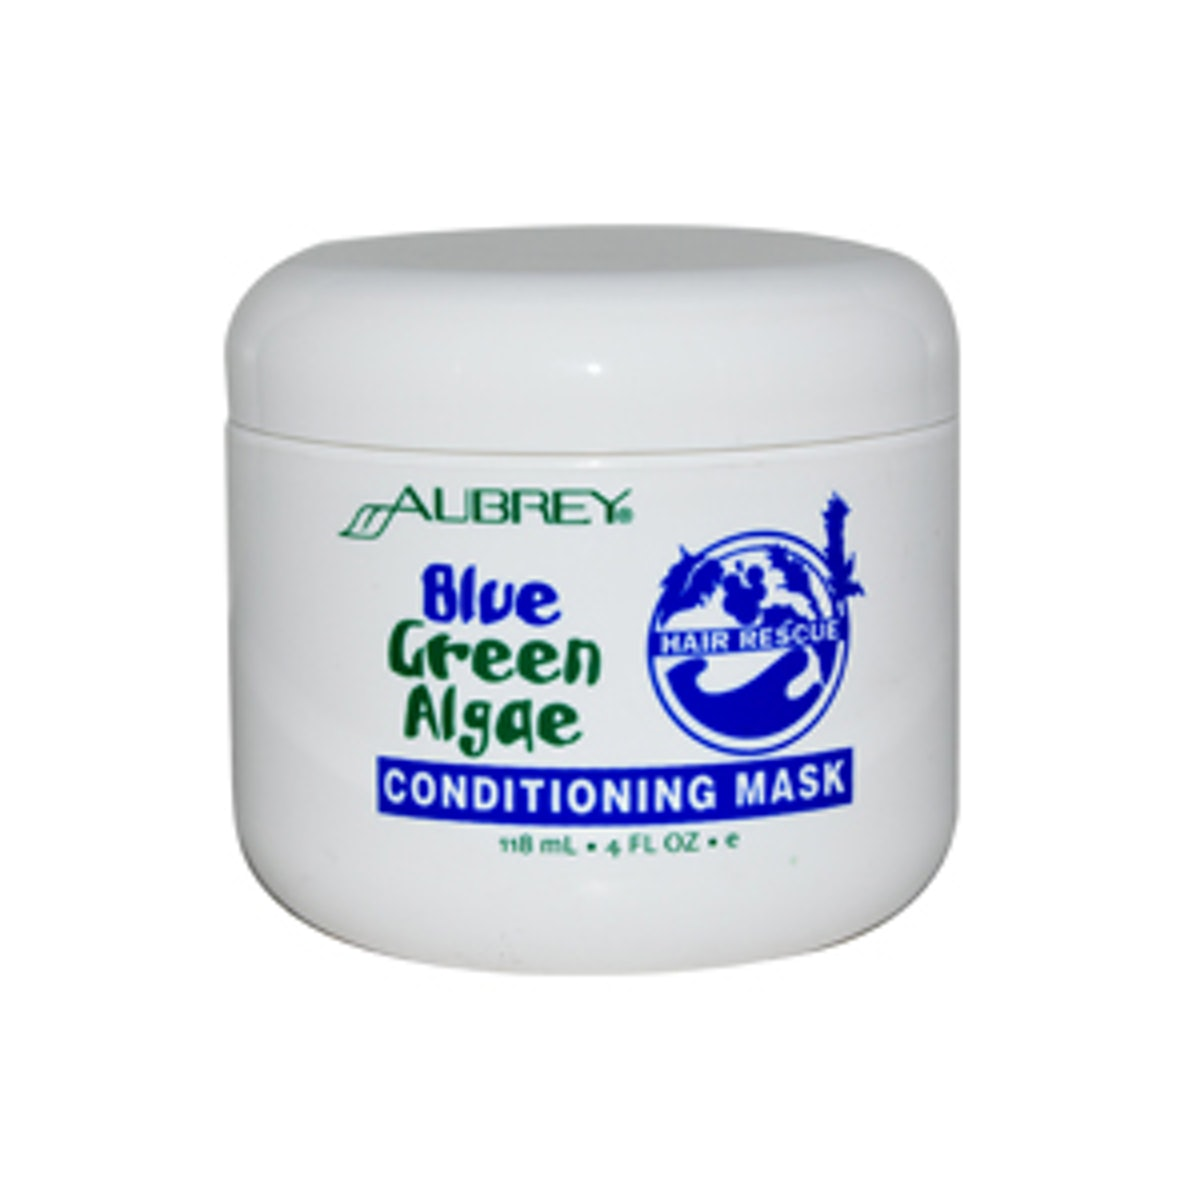 Blue Green Algae Conditioning Hair Mask